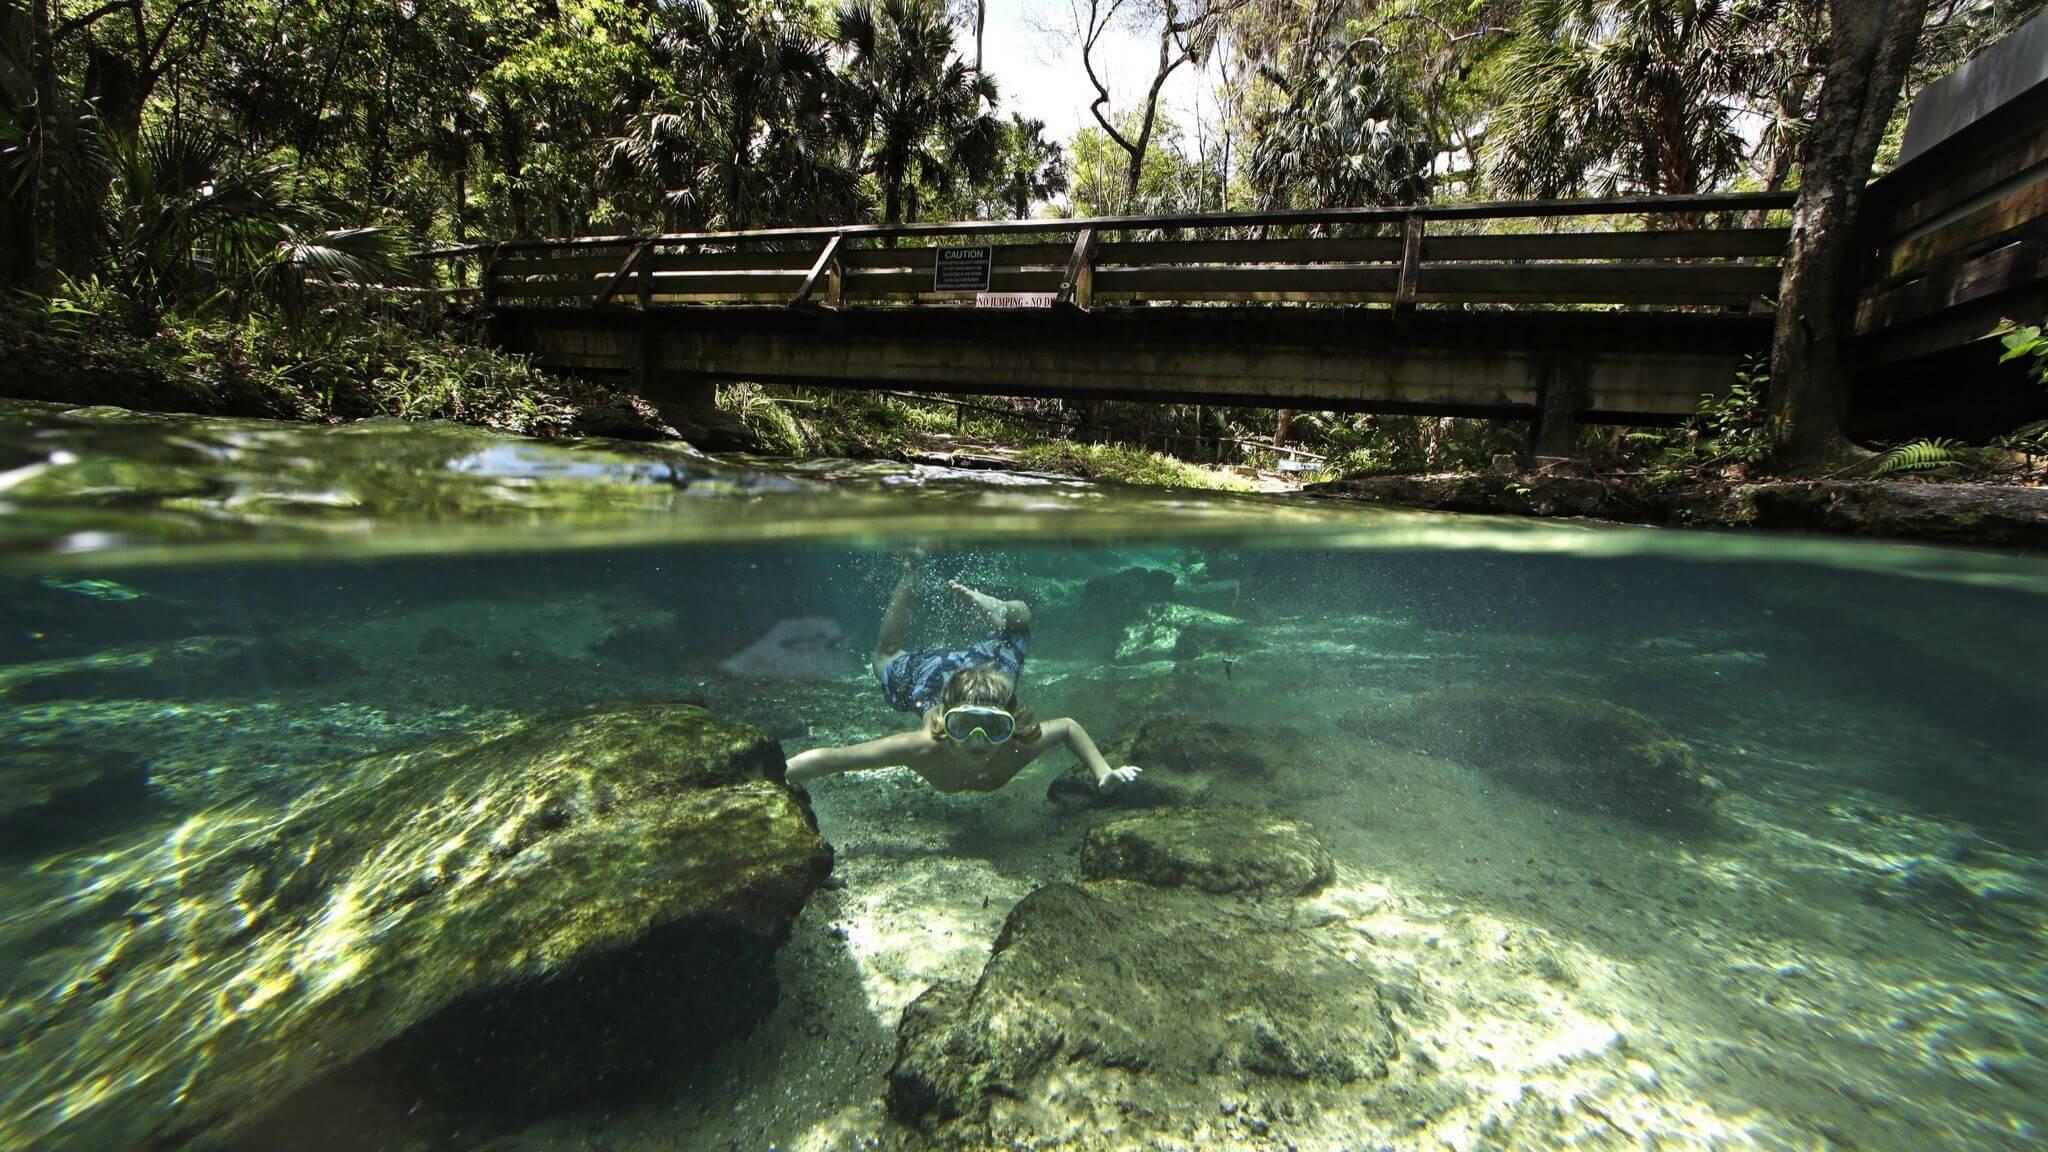 Passeio por Rock Springs Run em Kelly Park perto de Orlando: snorkeling